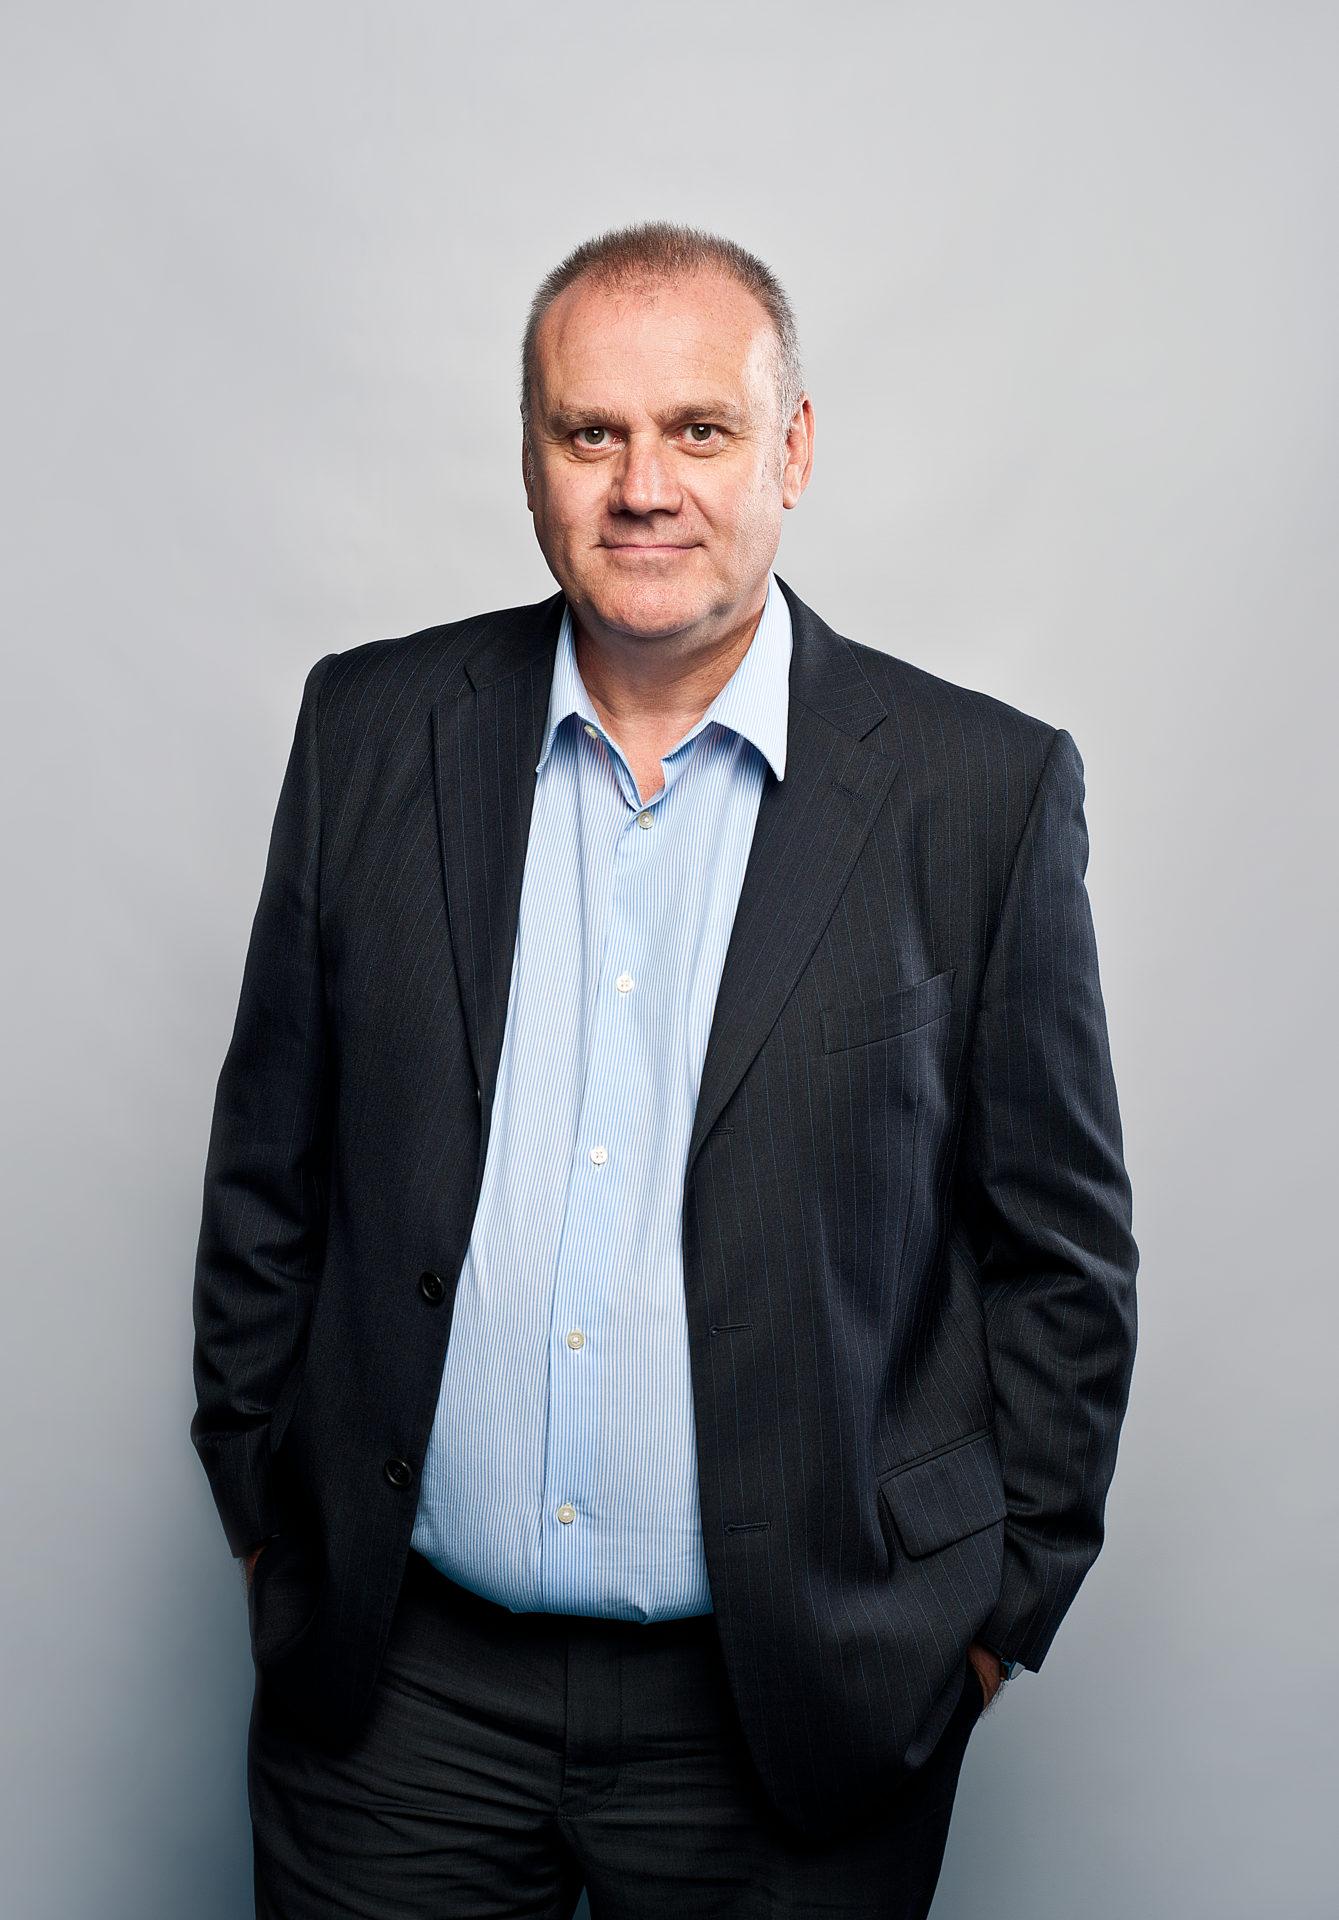 Geoff Cowper